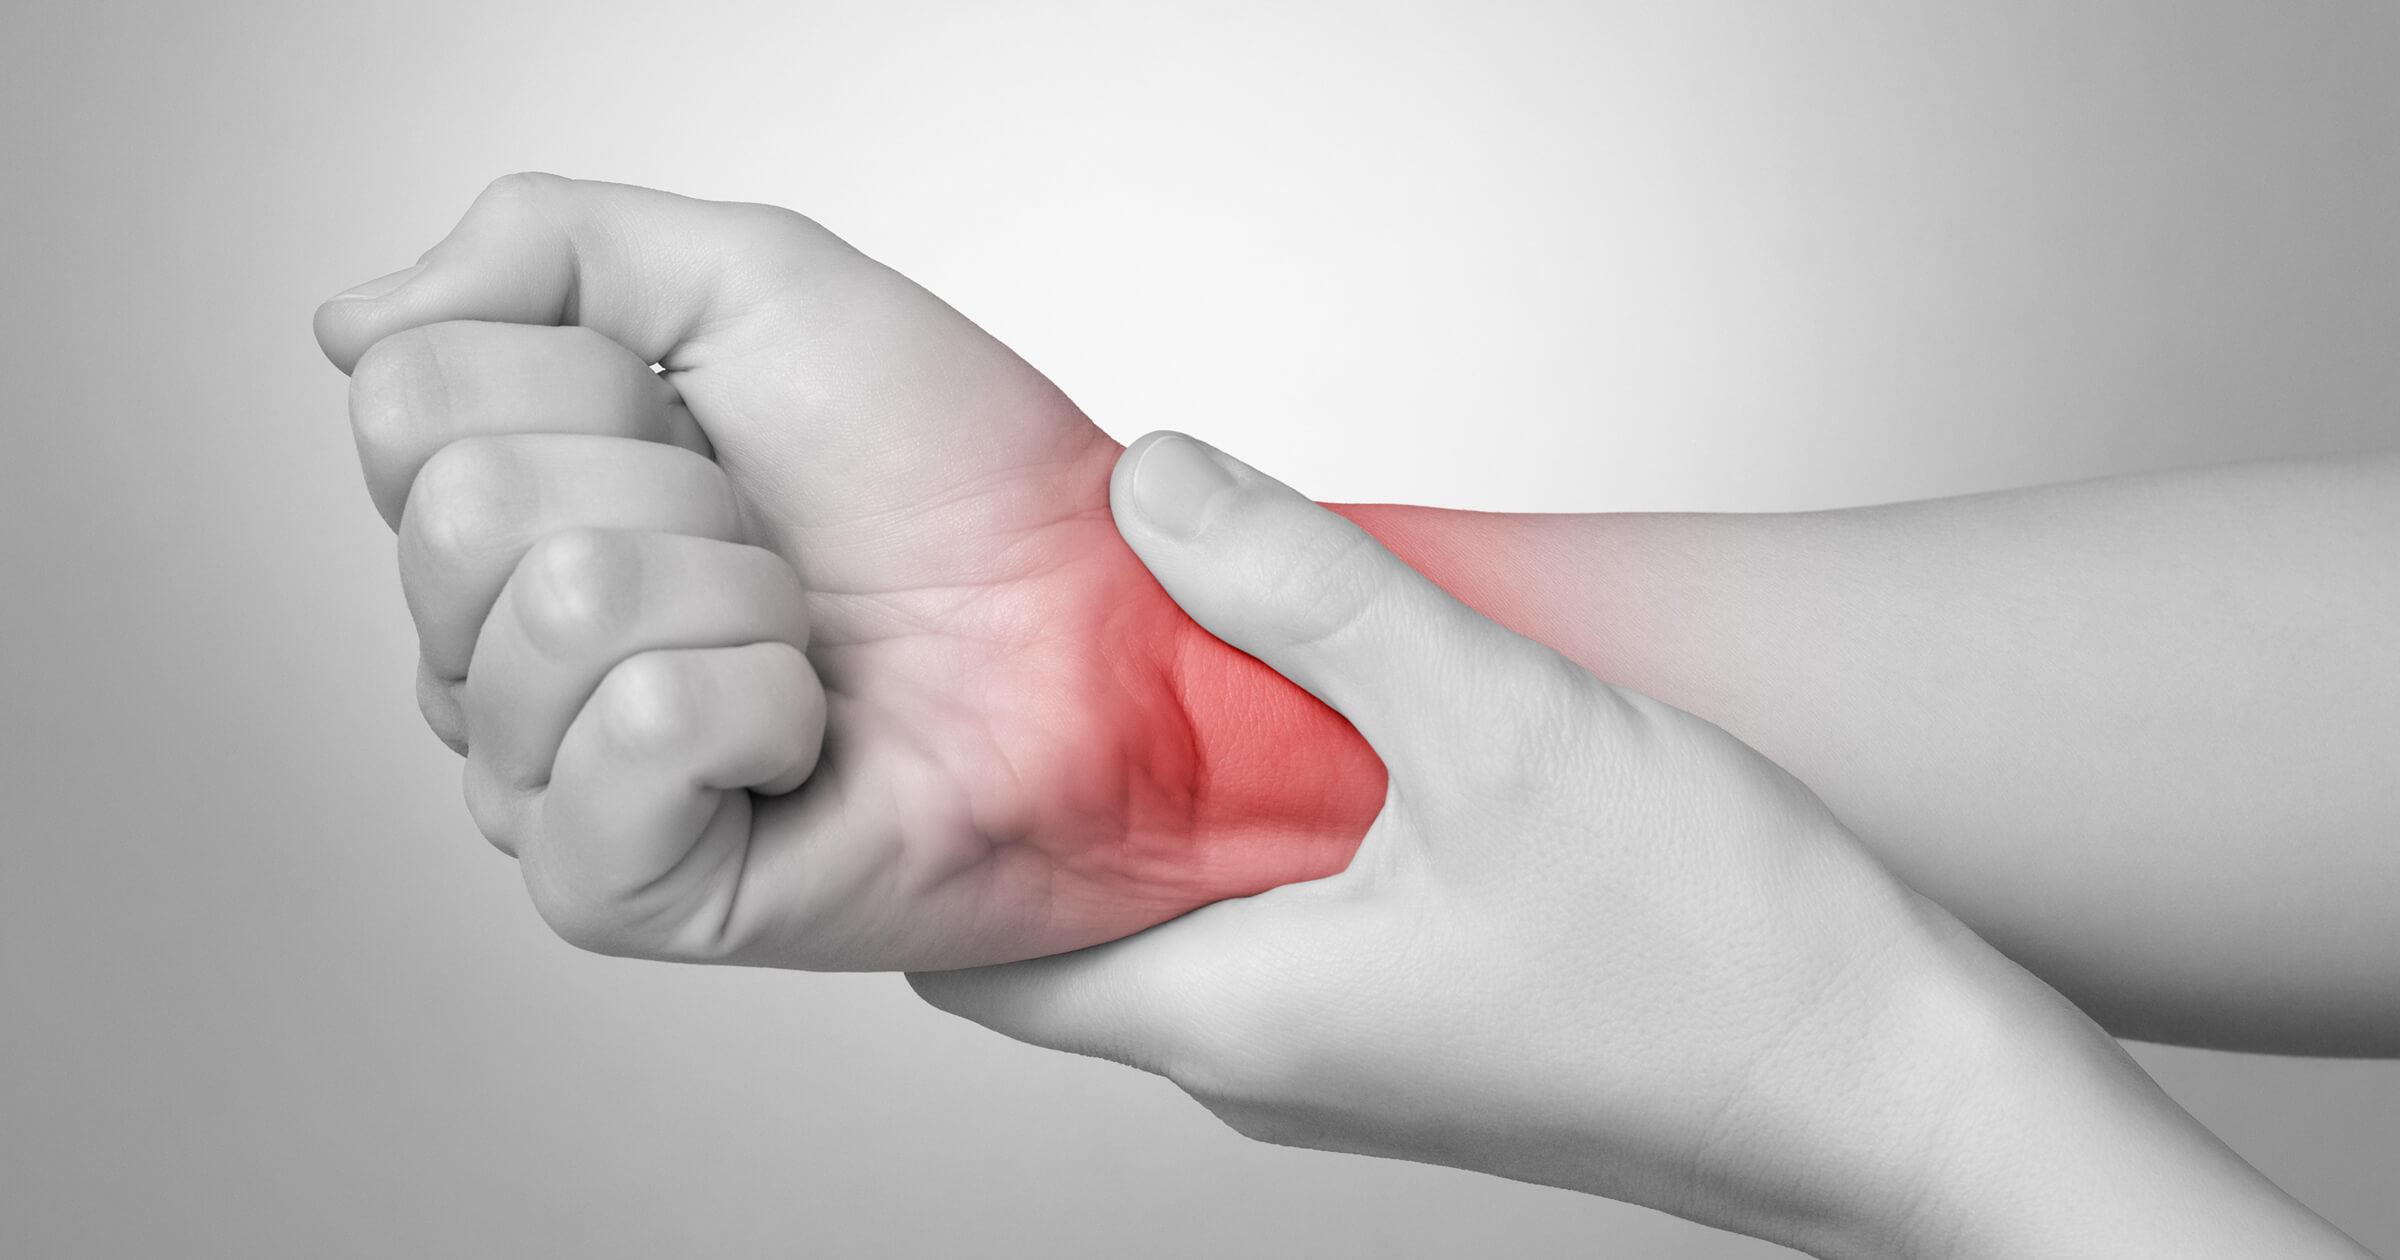 Smertesyndrom (CRPS) etter håndleddsbrudd